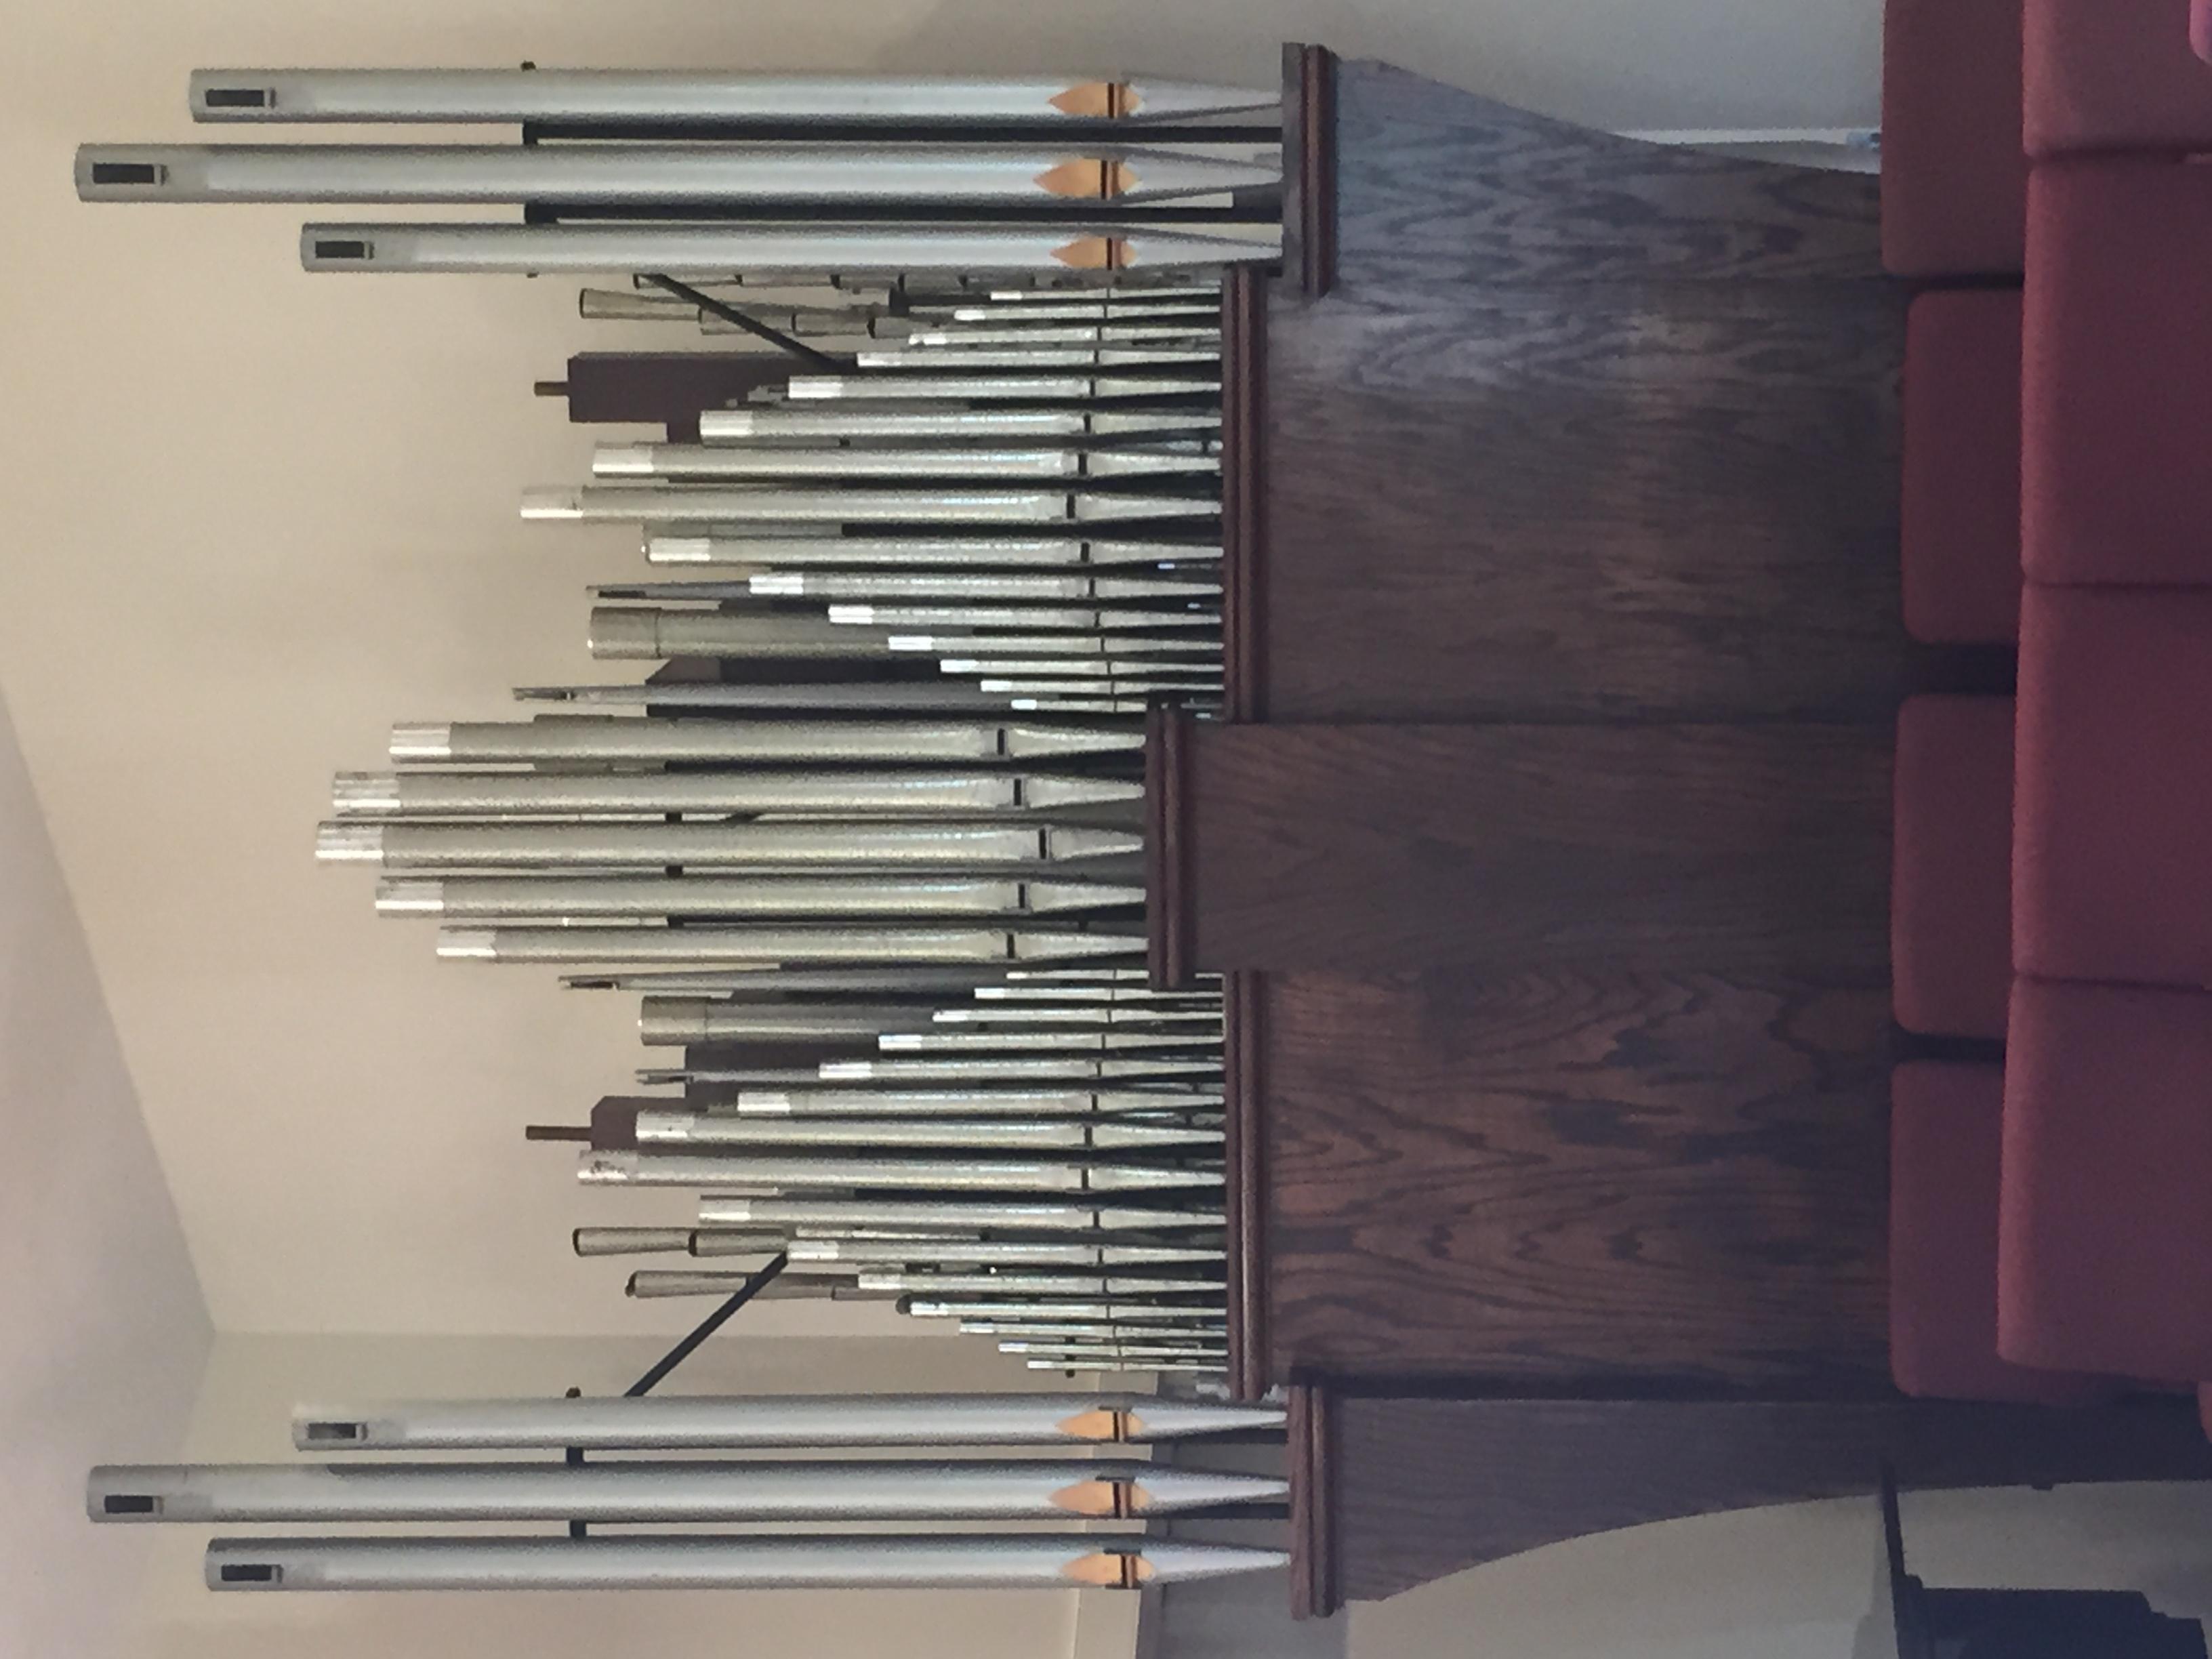 Tappahannock Presbyterian